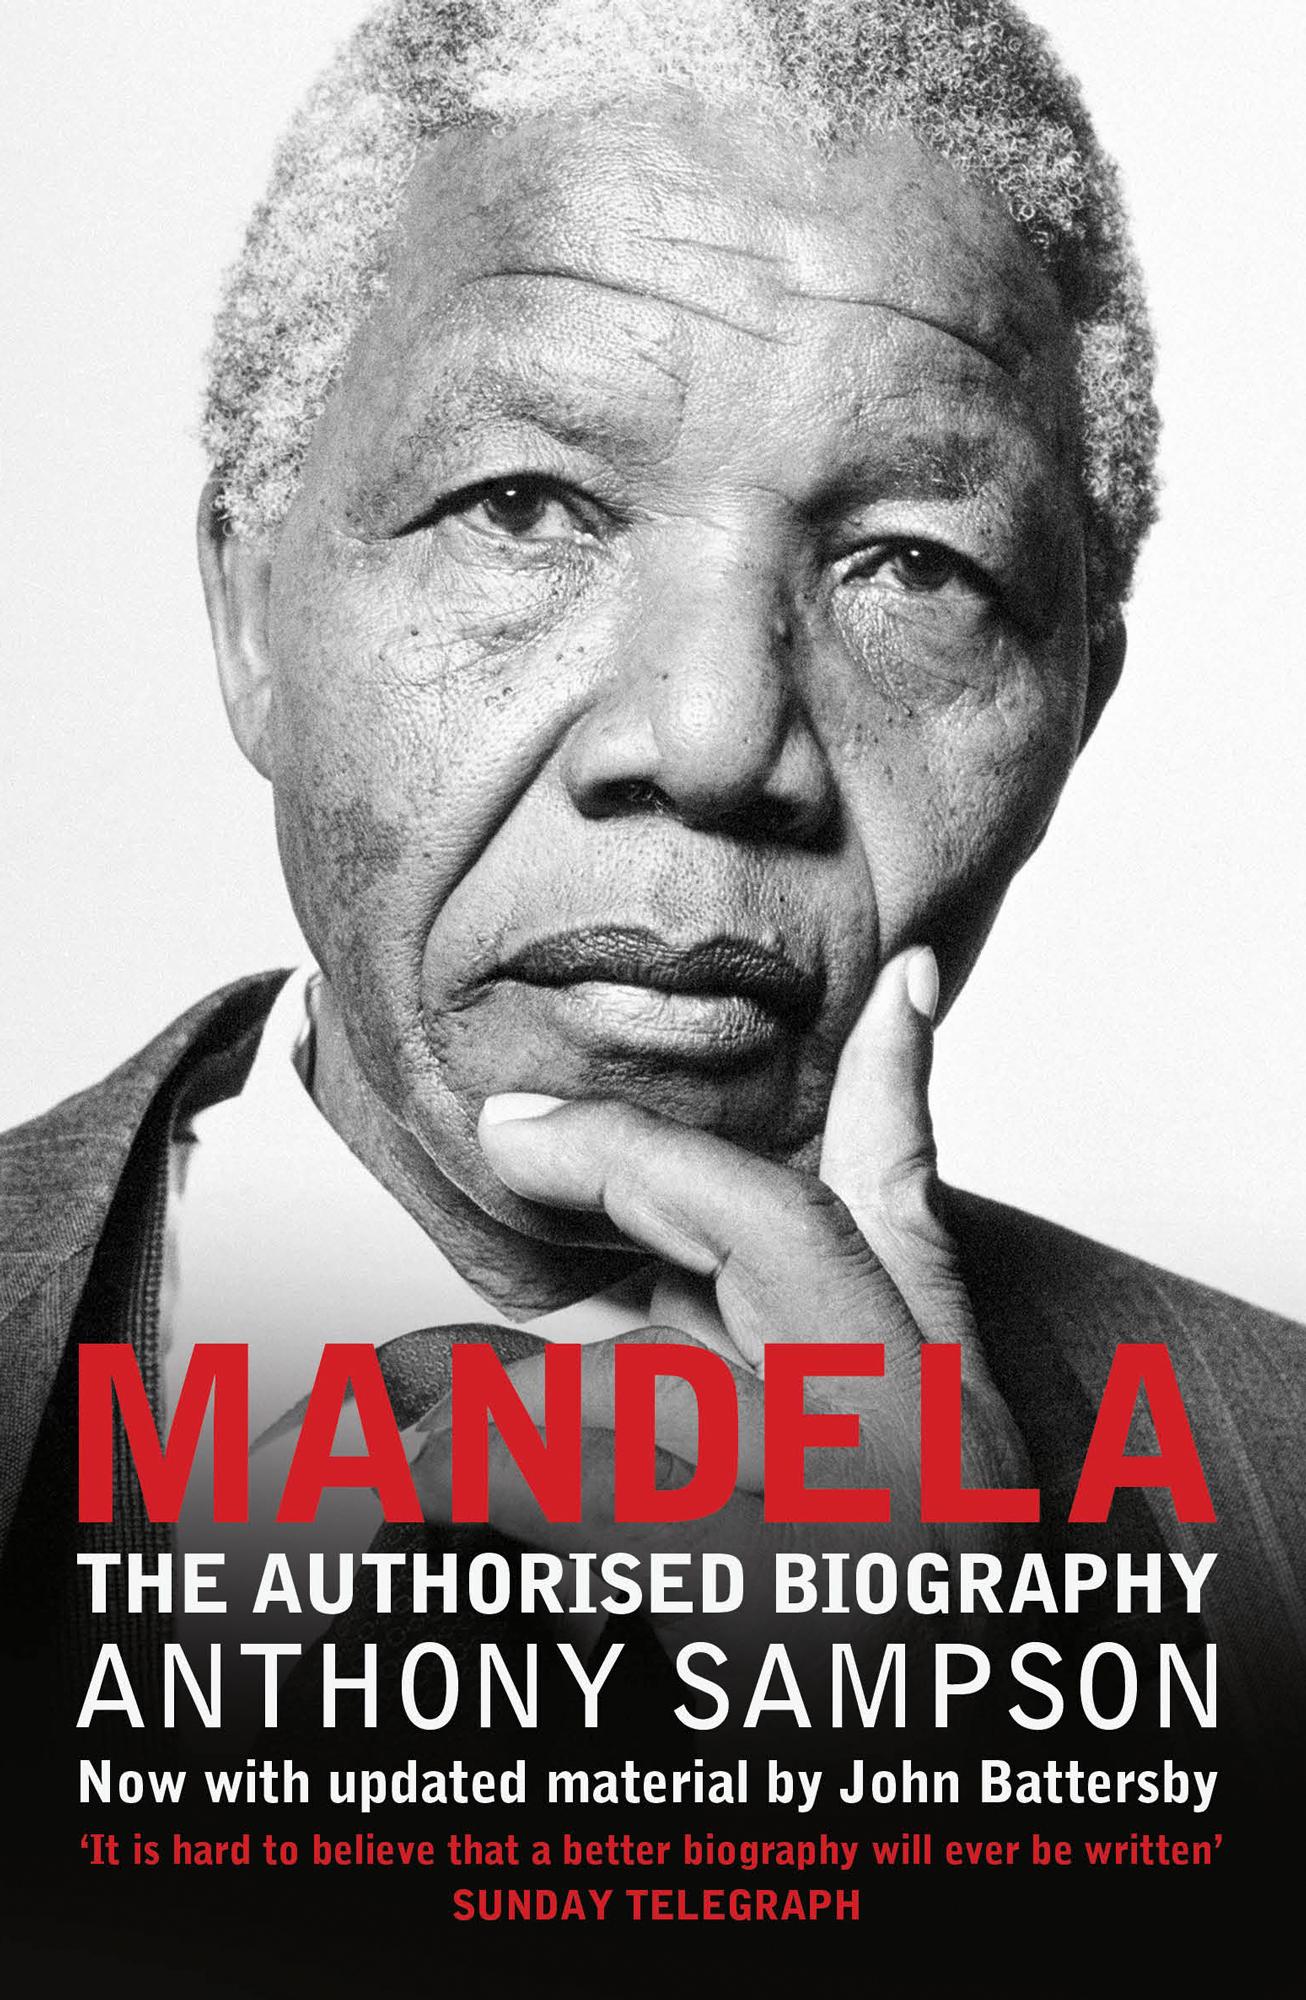 Anthony Sampson Mandela: The Authorised Biography south african style